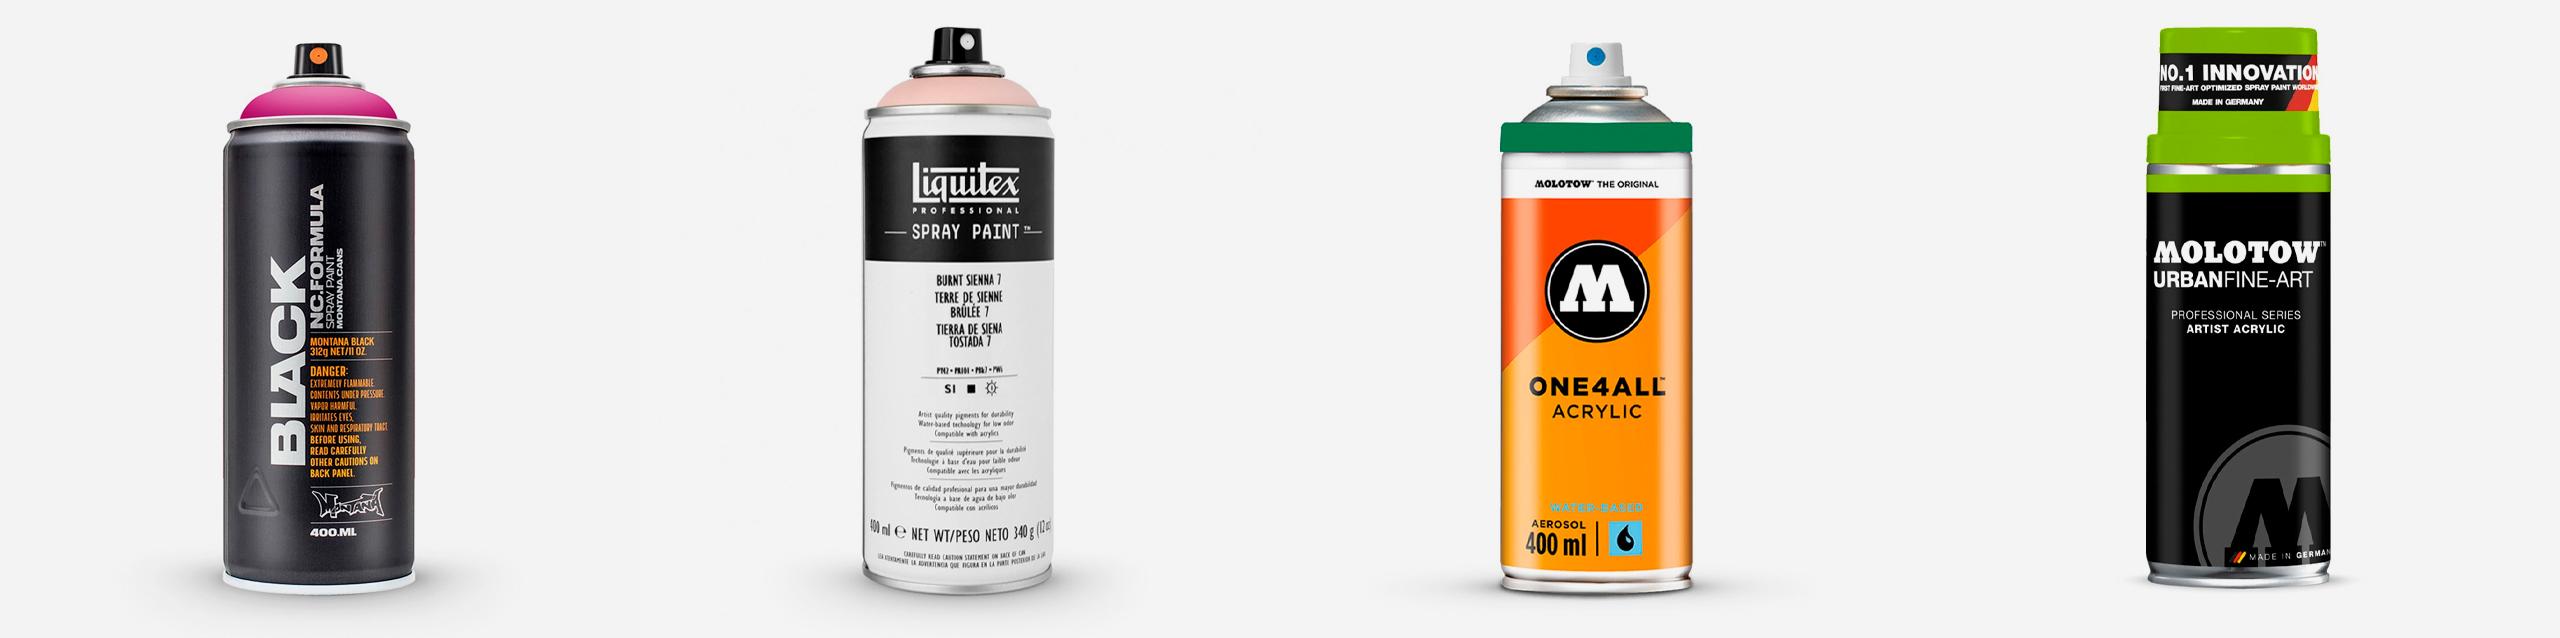 L-R: Montana Black Spray Paint, Liquitex Professional Acrylic Spray Paint, Molotow One4All Acrylic Spray Paint, Molotow Urban Fine Art Artist Acrylic Spray Paint